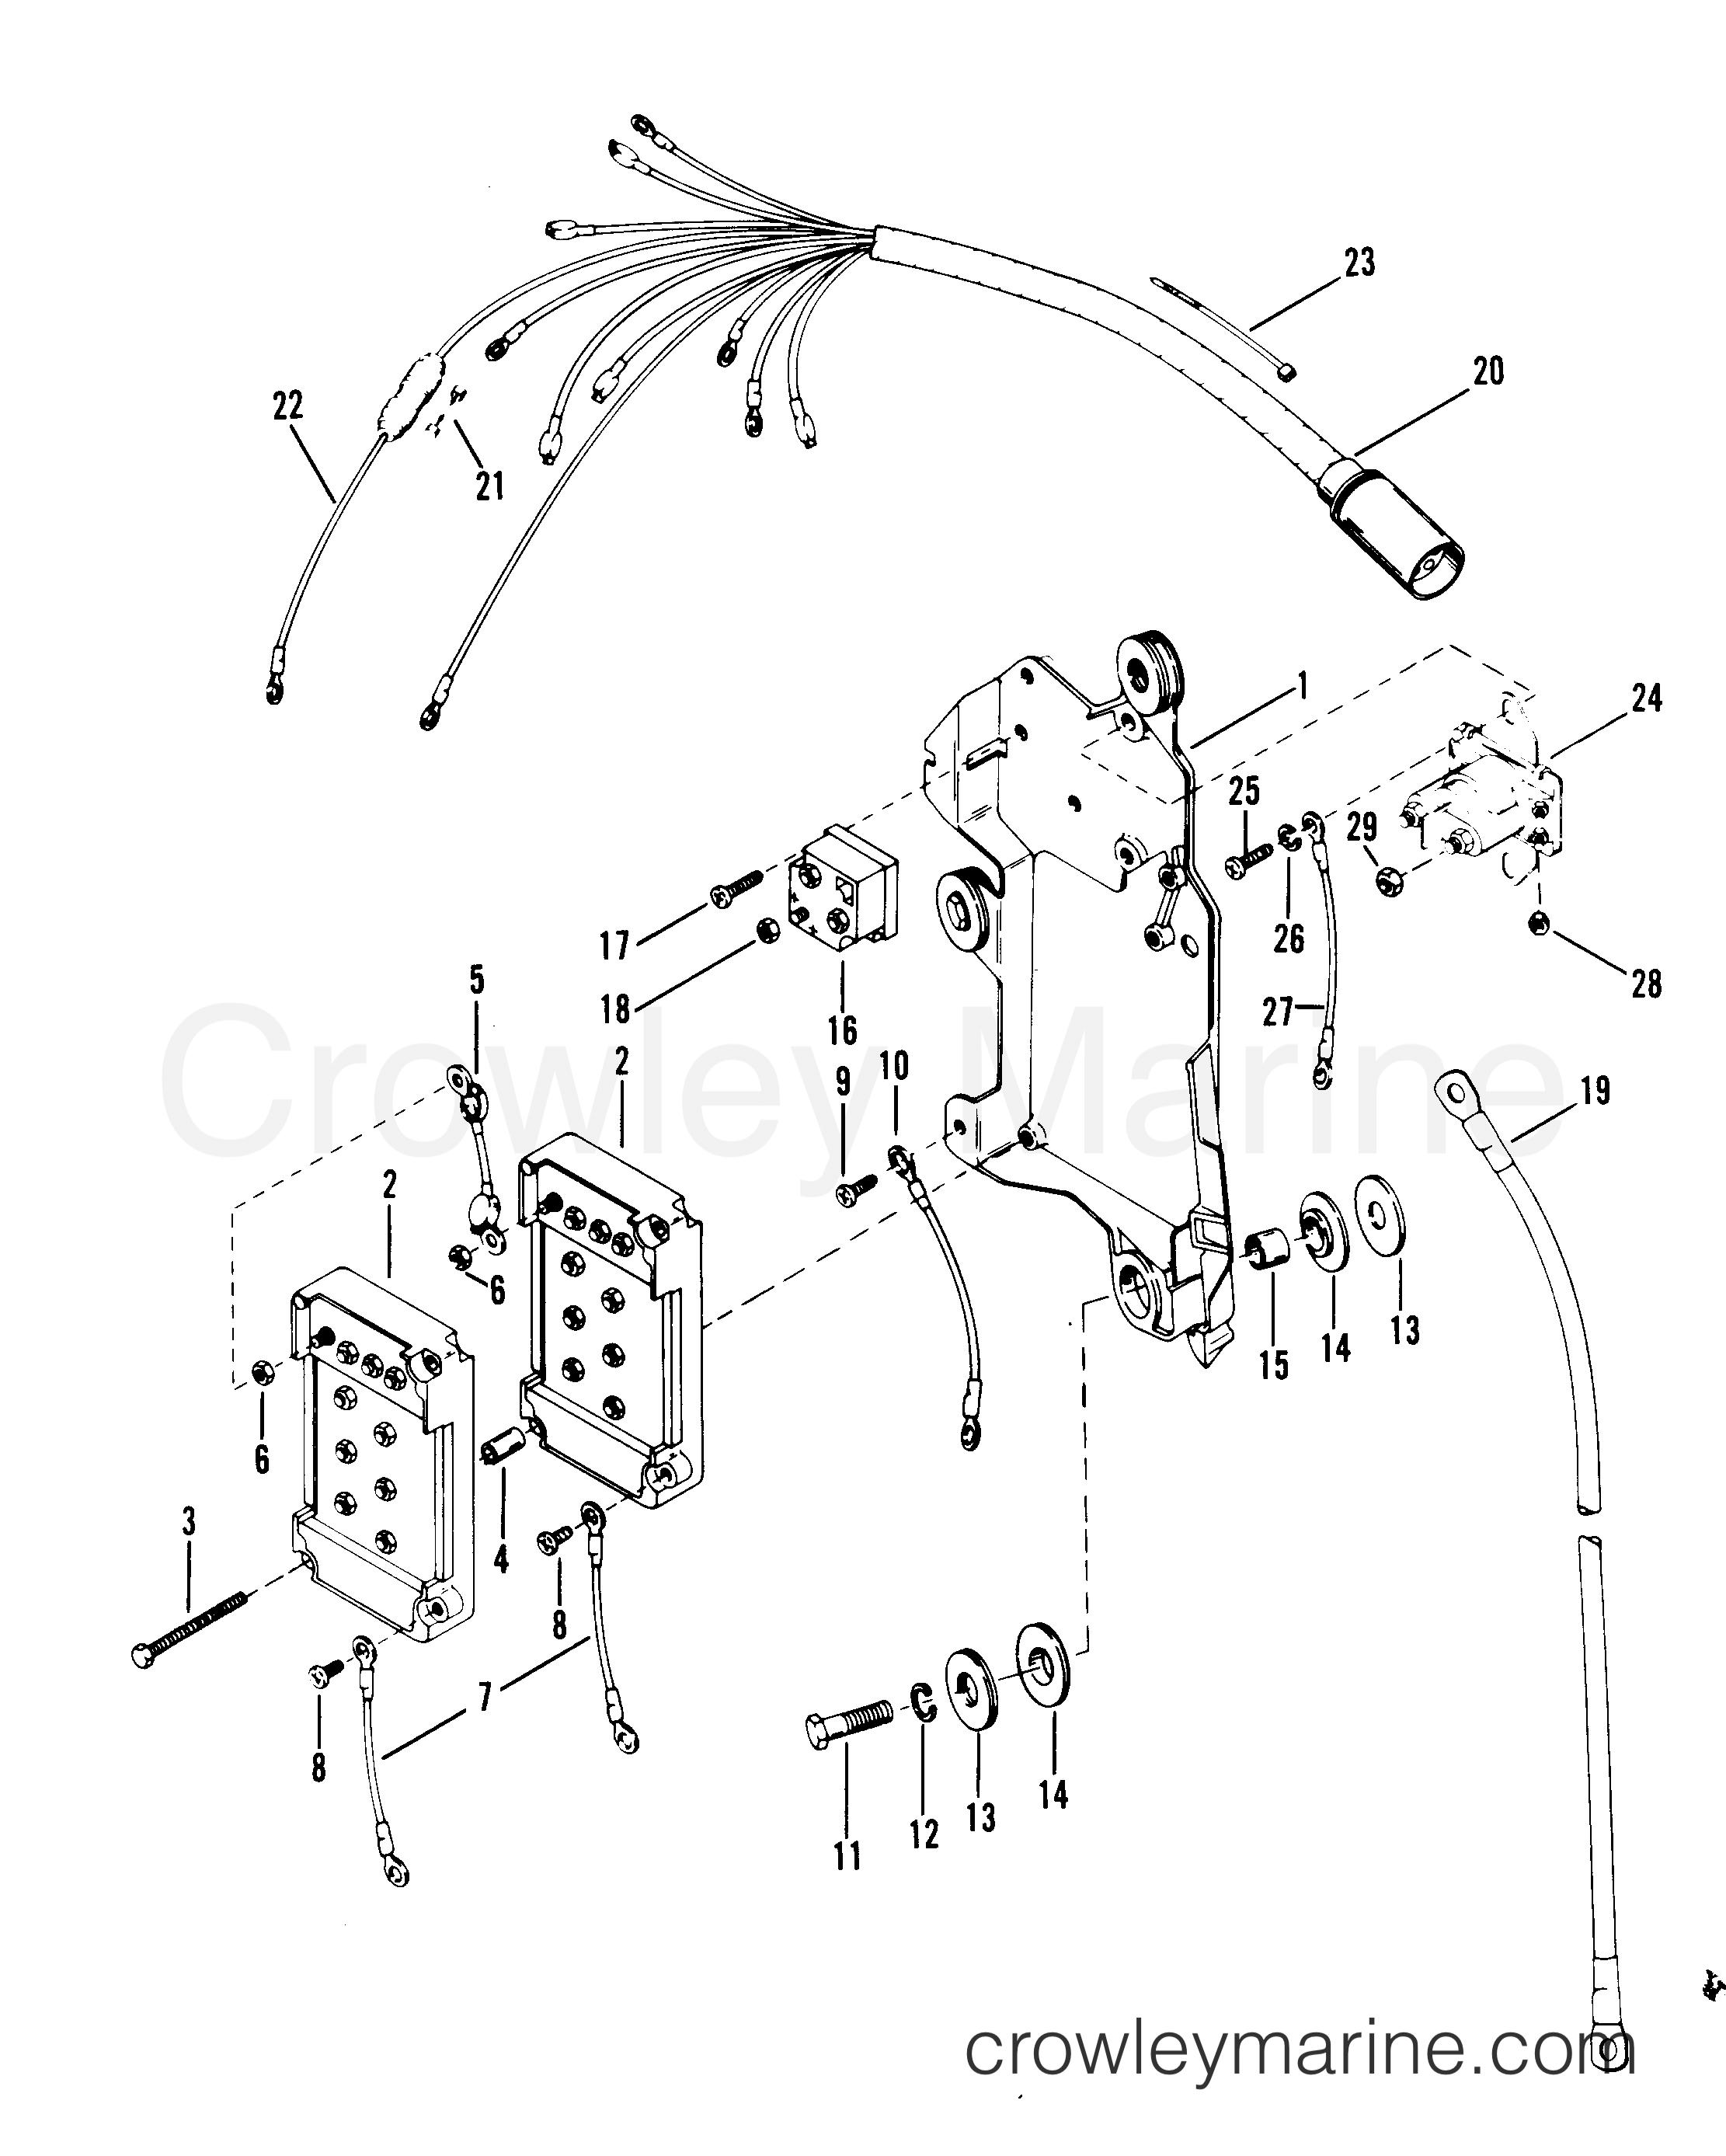 race wiring a starter wiring diagram Ford Ignition Control Module Wiring Diagram wiring harness starter solenoid and rectifier serial rangeserial range mercury race outboard merc mod vp